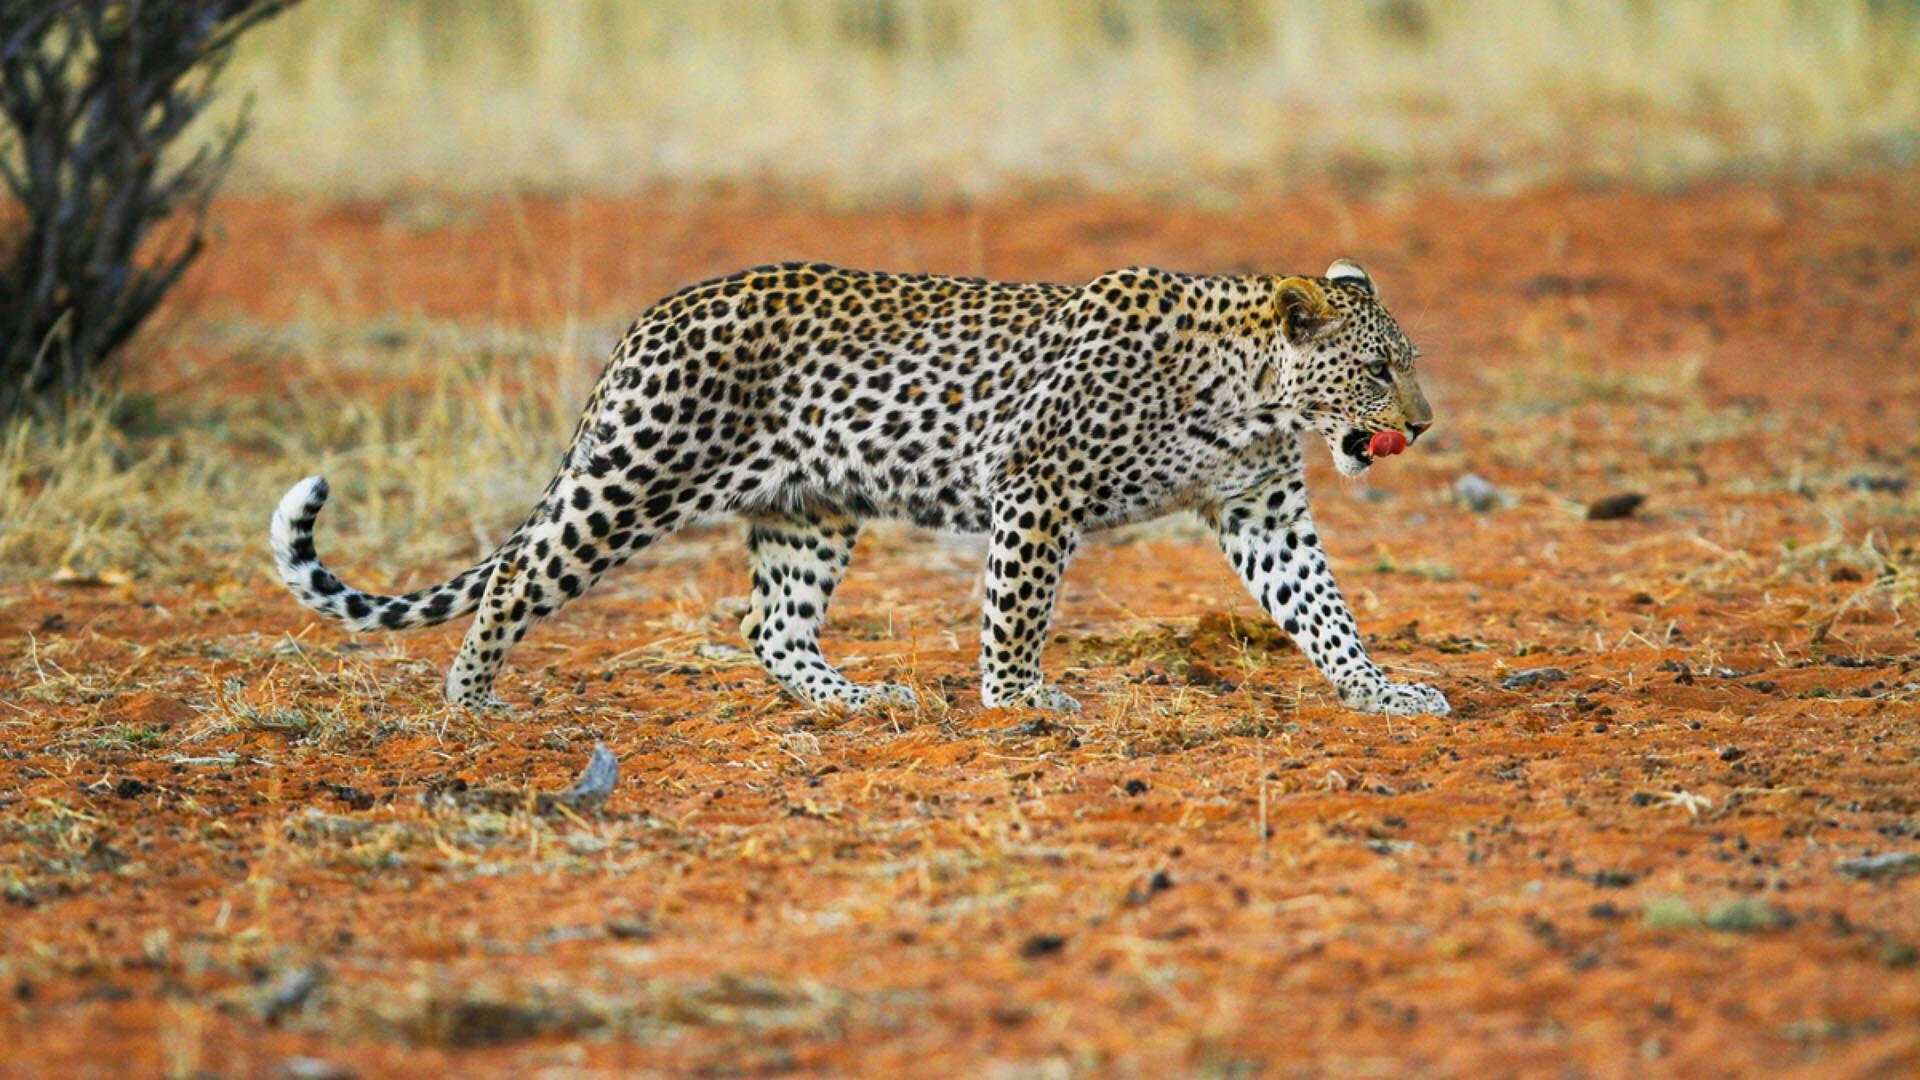 Tswalu Reserve Afrique Sud Leopard